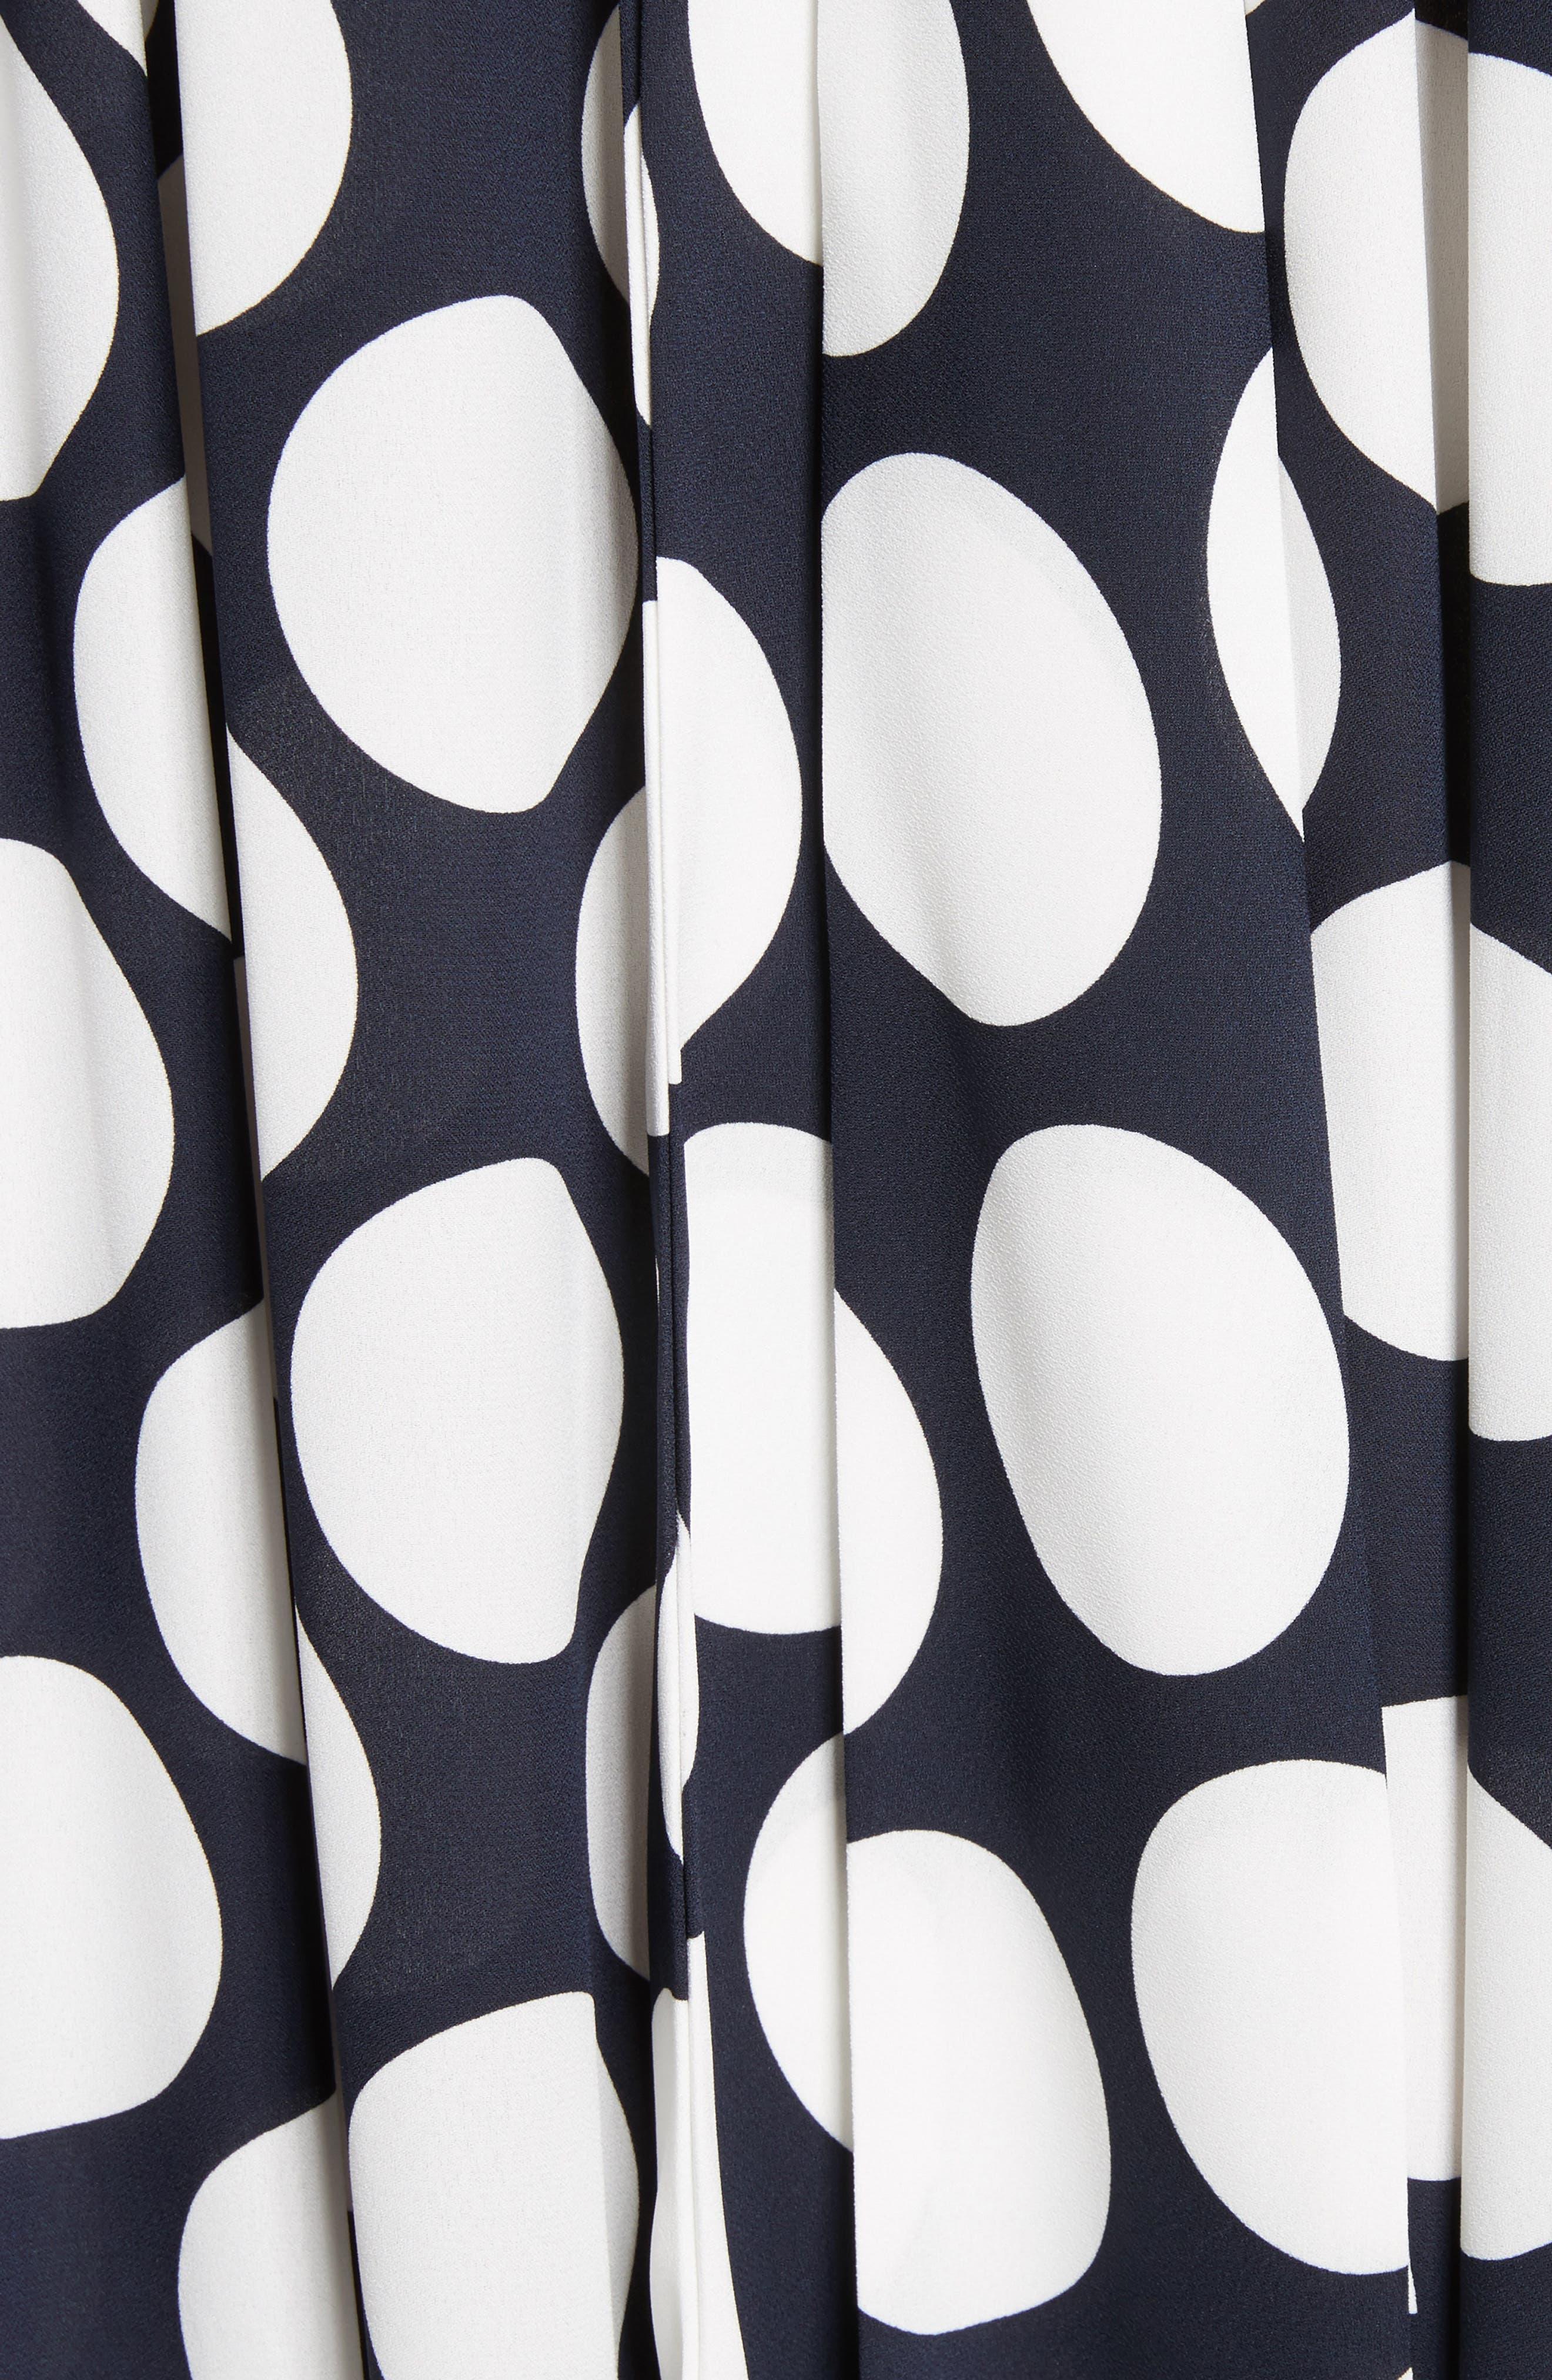 Giant Polka Dot Gathered Collar Dress,                             Alternate thumbnail 5, color,                             410